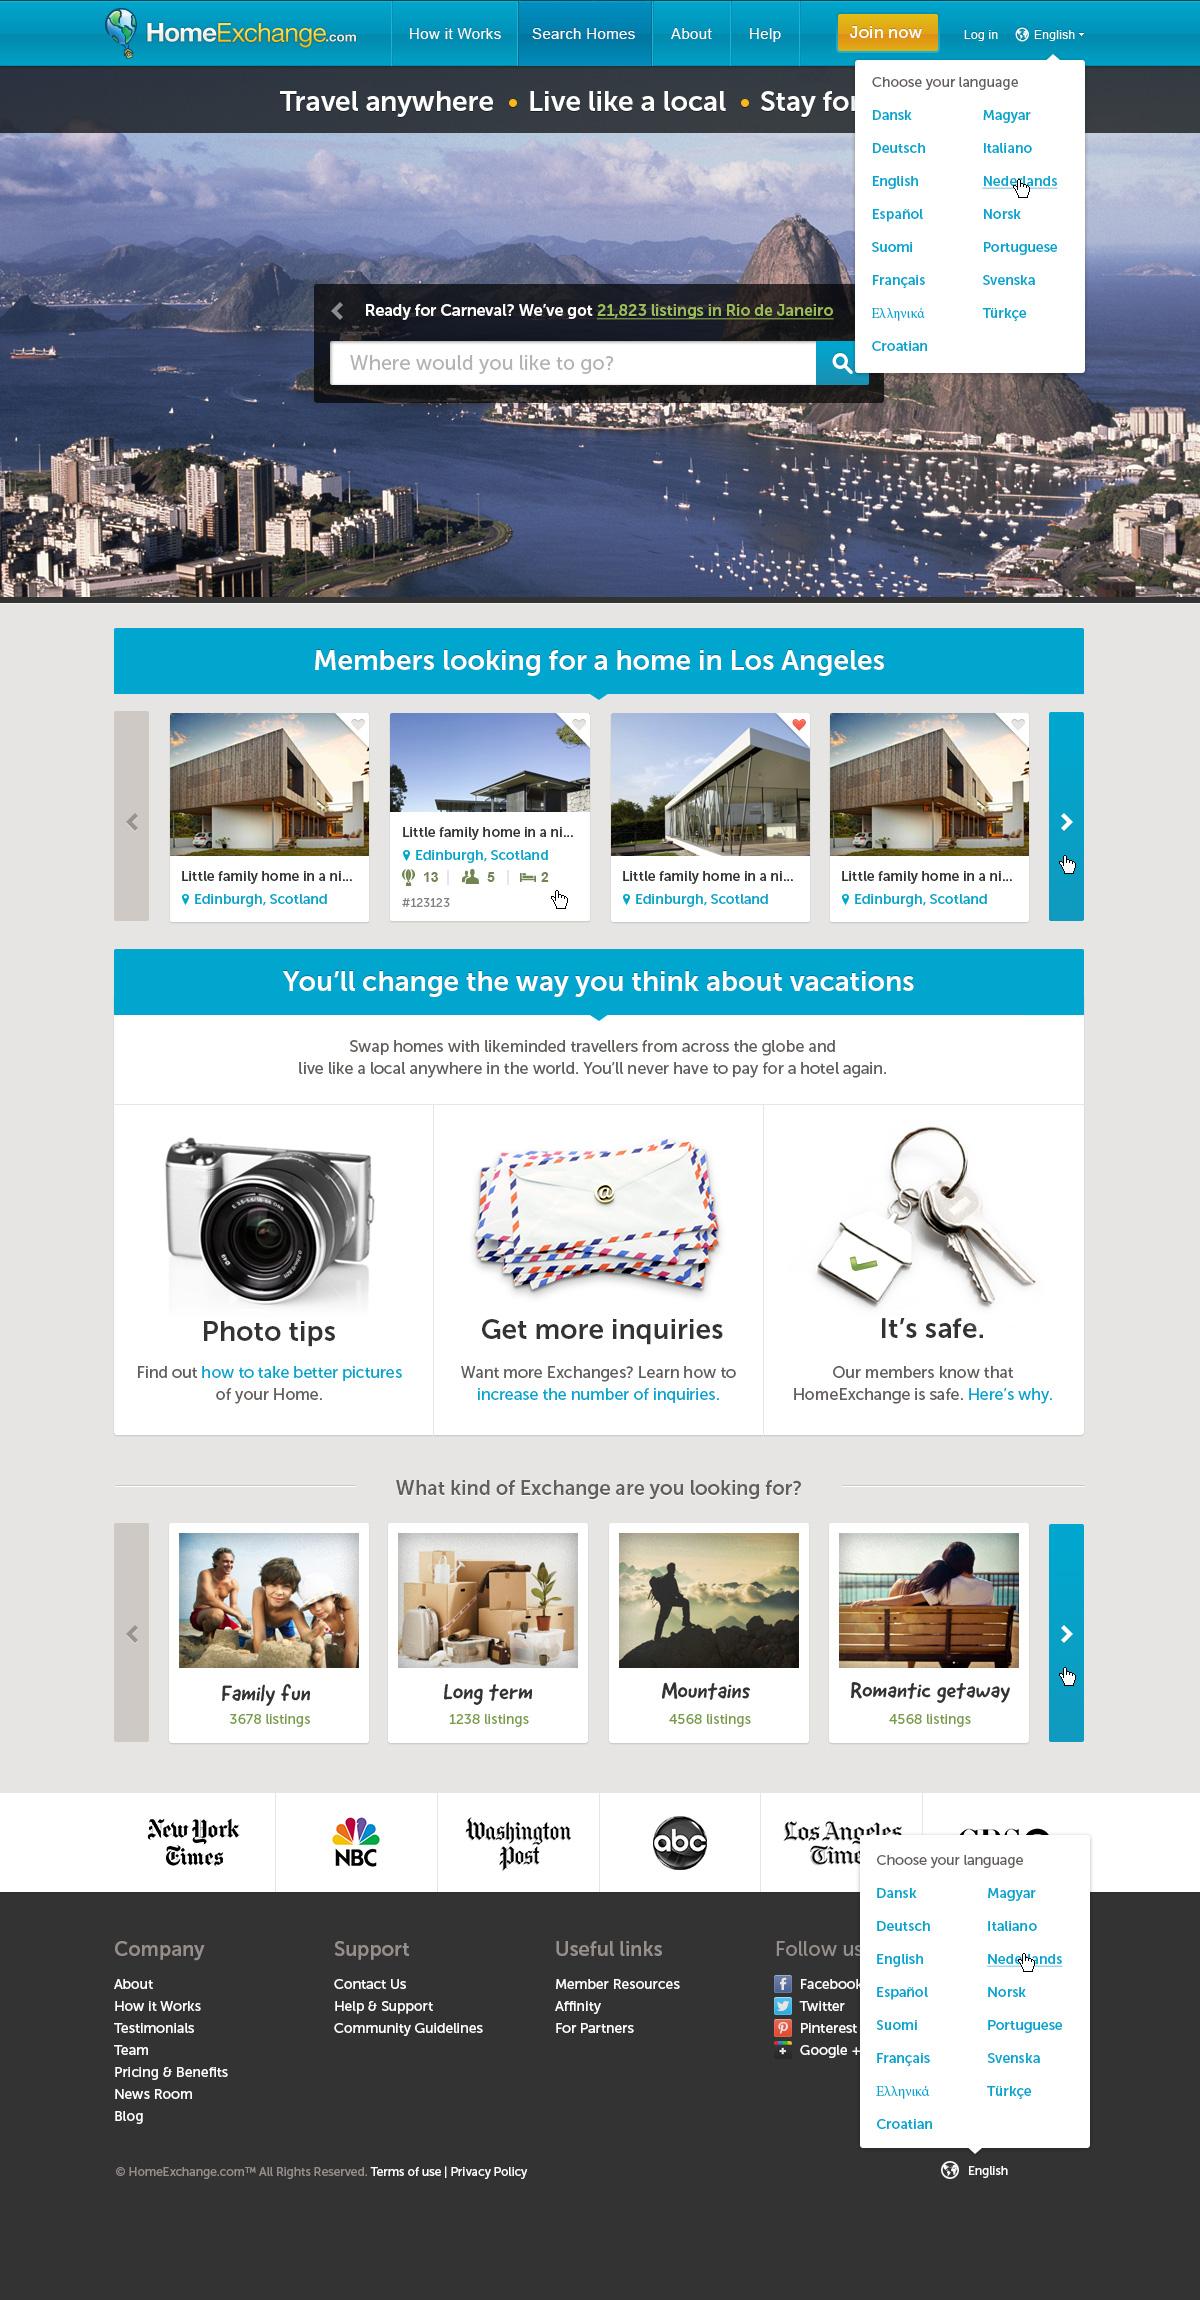 HomeExchange.com homepage